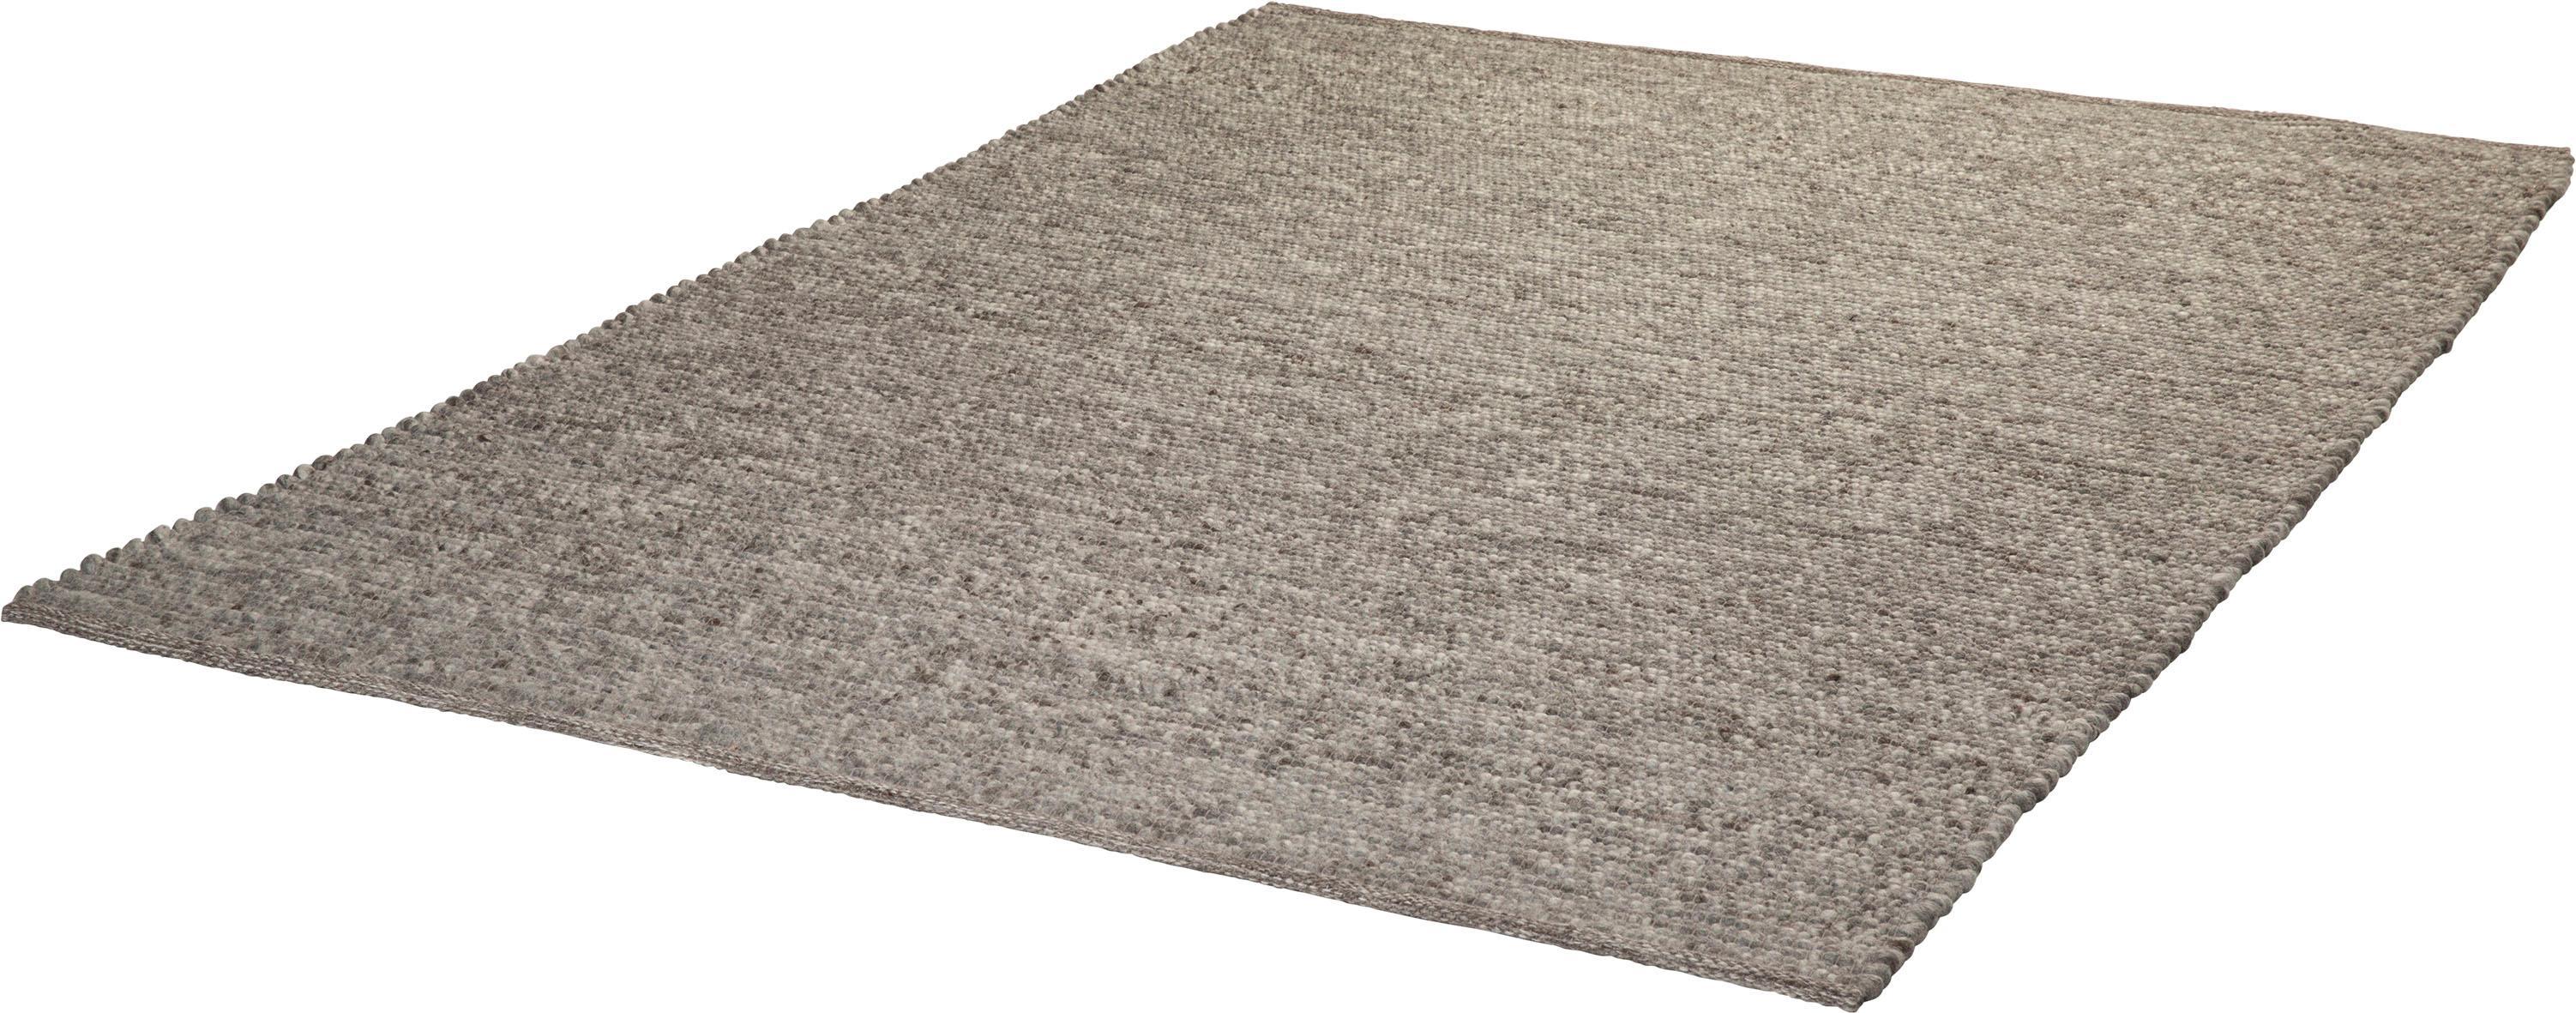 Teppich My Kjell 865 Obsession rechteckig Höhe 10 mm handgewebt